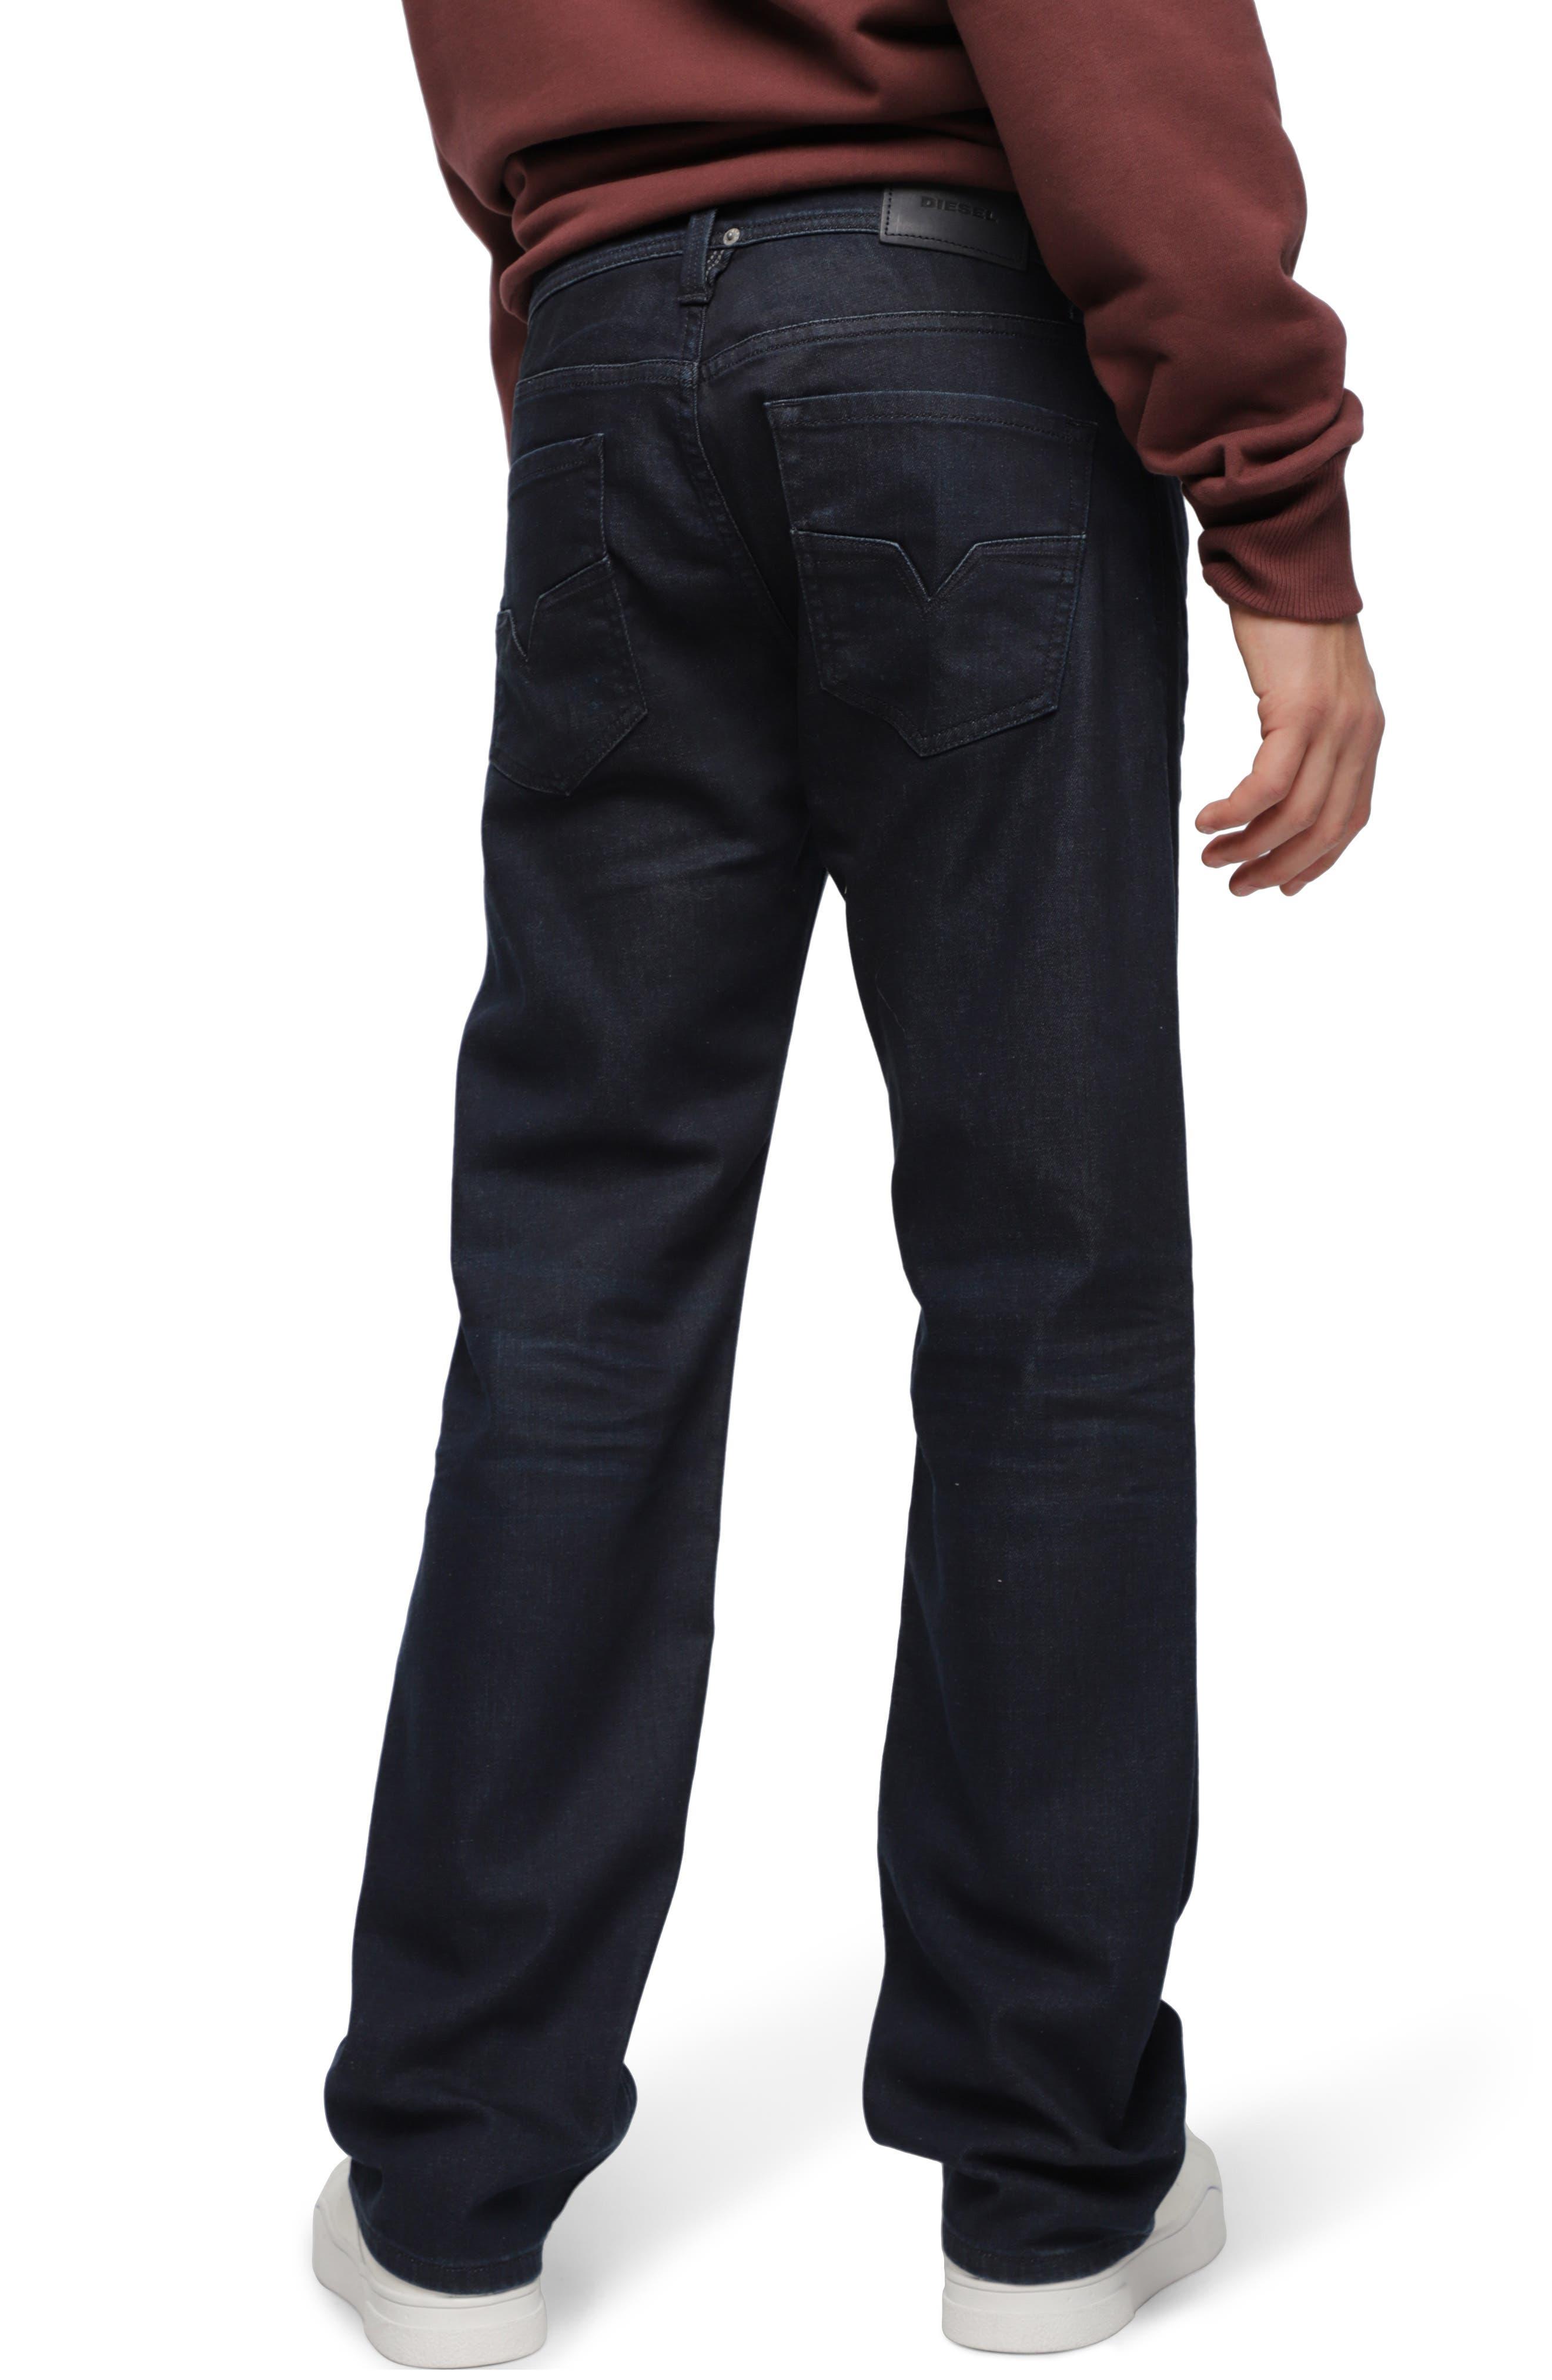 Larkee Relaxed Straight Leg Jeans,                             Alternate thumbnail 2, color,                             C84ZC